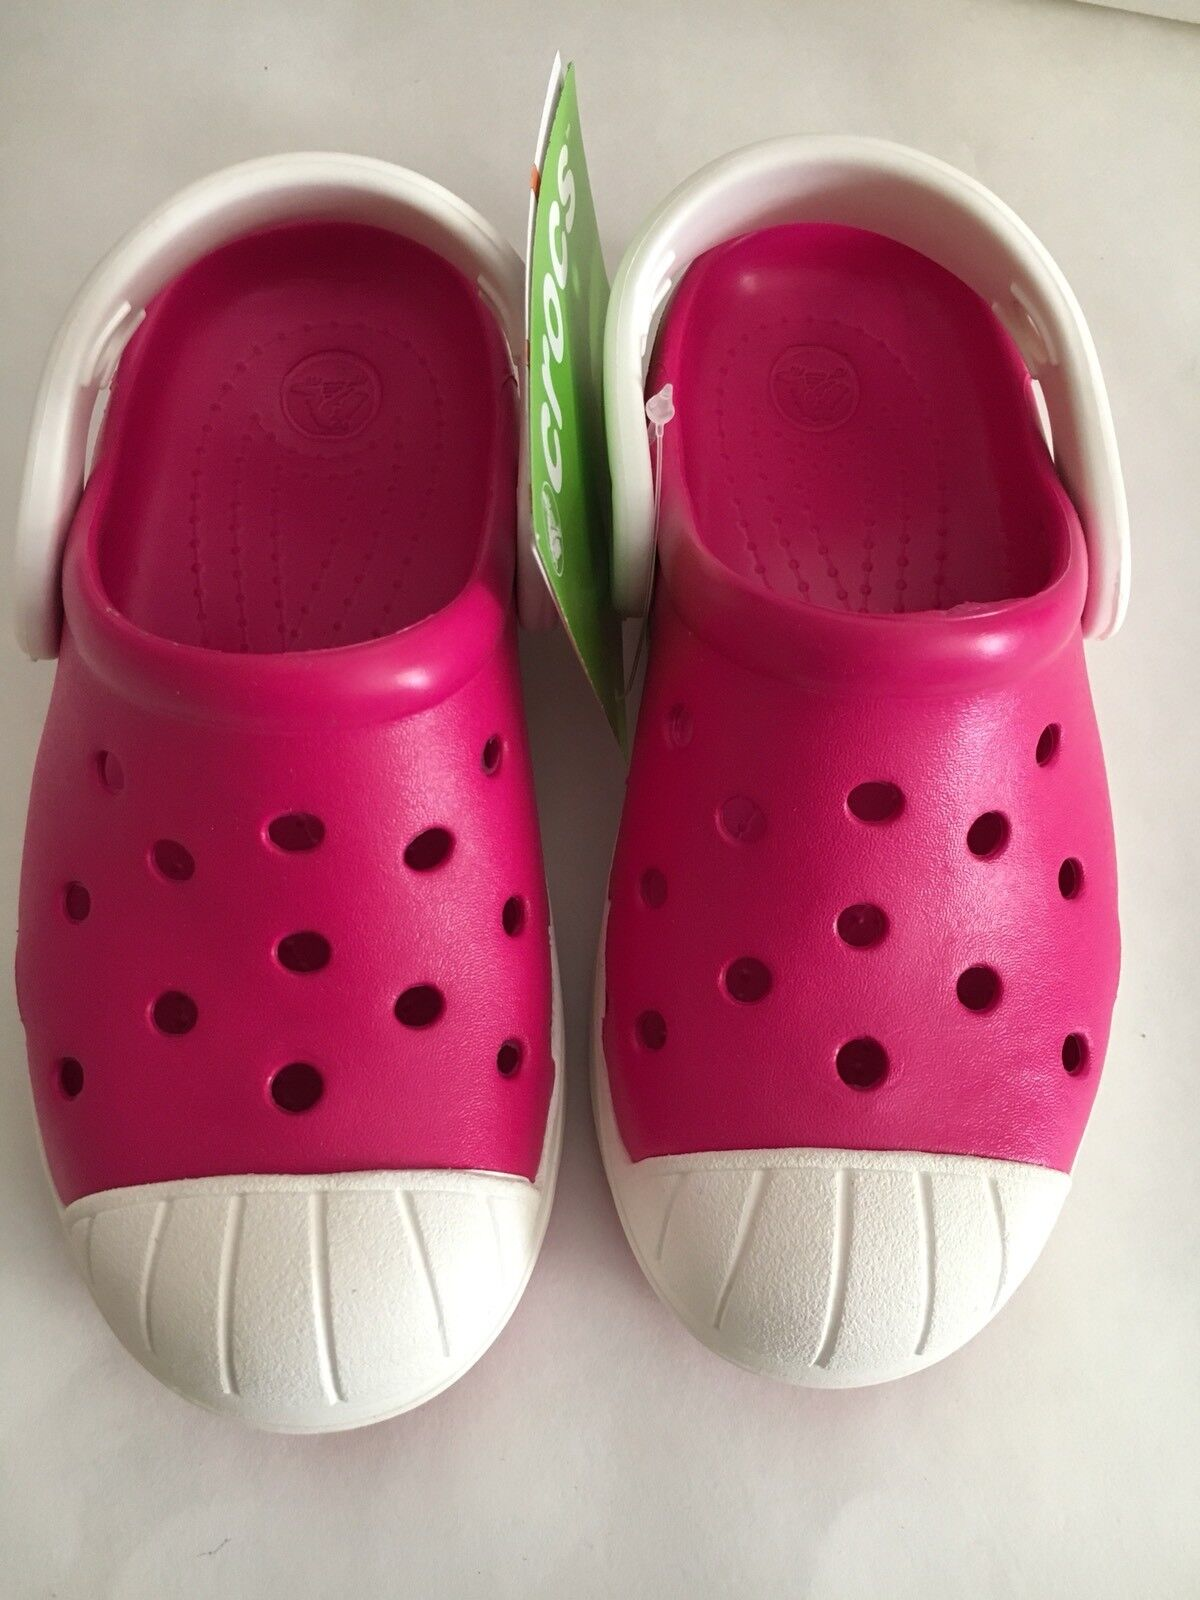 Crocs Bump It sandal slipper clog toddler Girl US size 10, 11, 12, 13 Pink